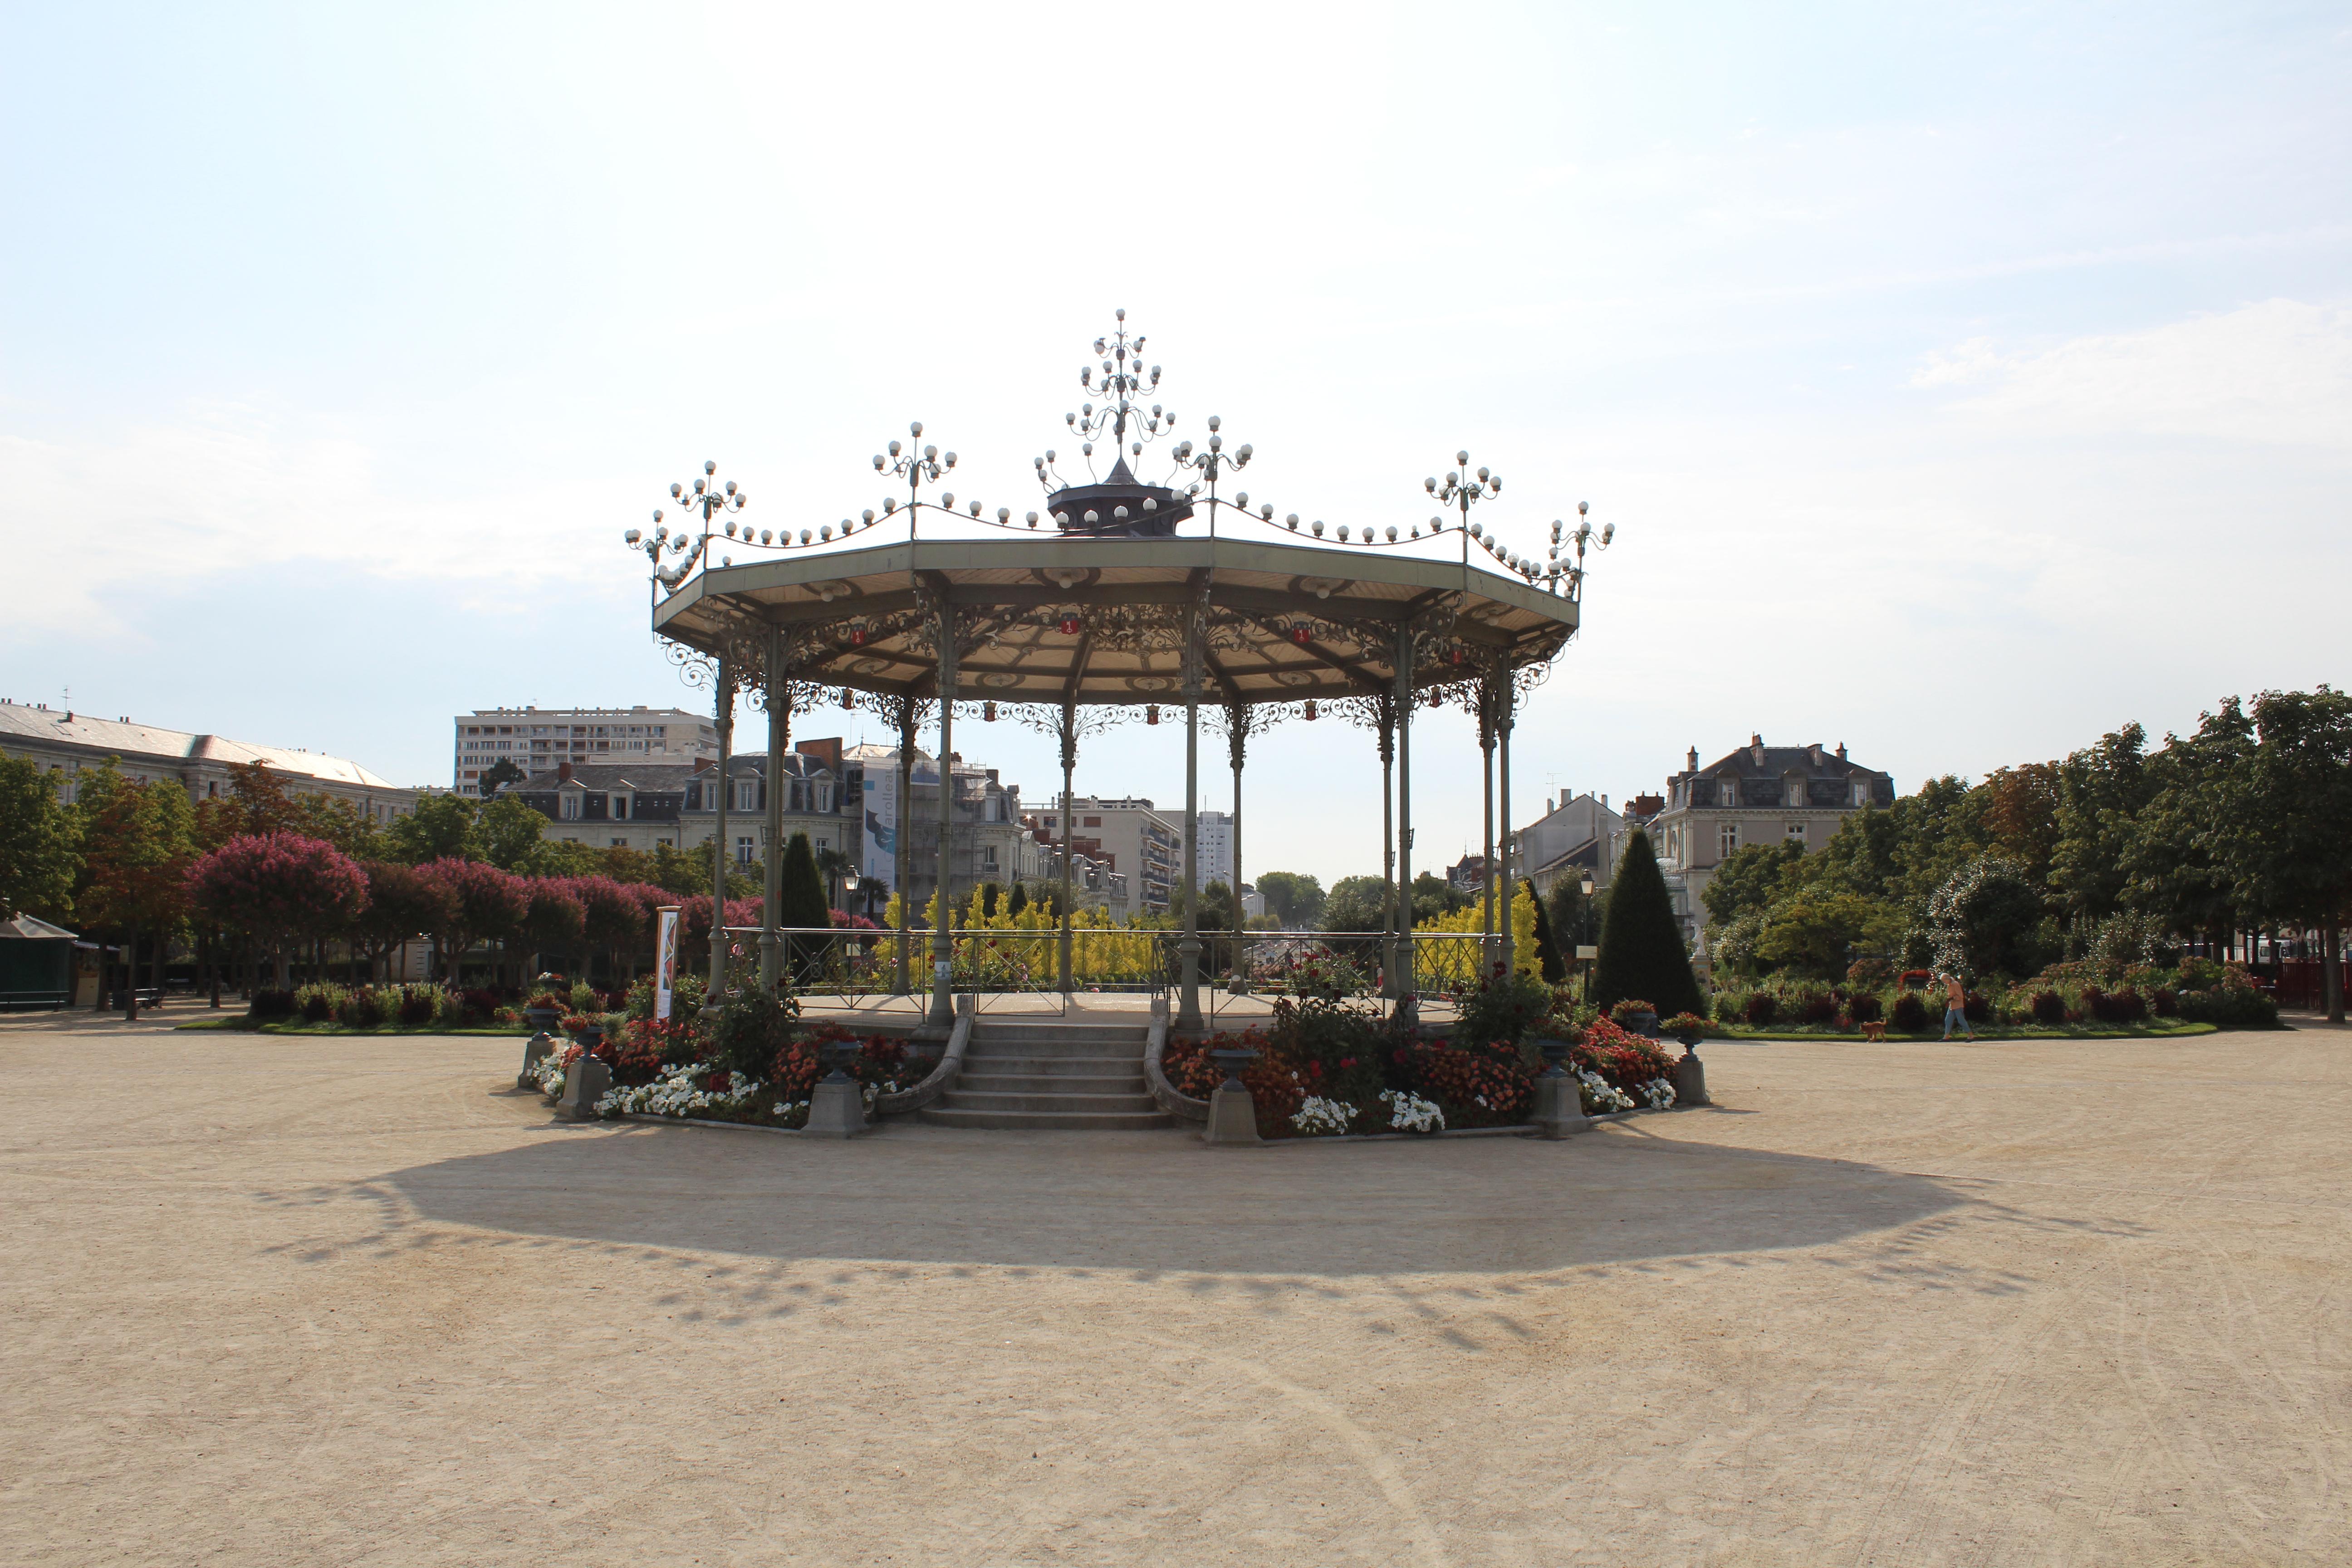 File:Kiosque Jardin Mail Angers 2.jpg - Wikimedia Commons